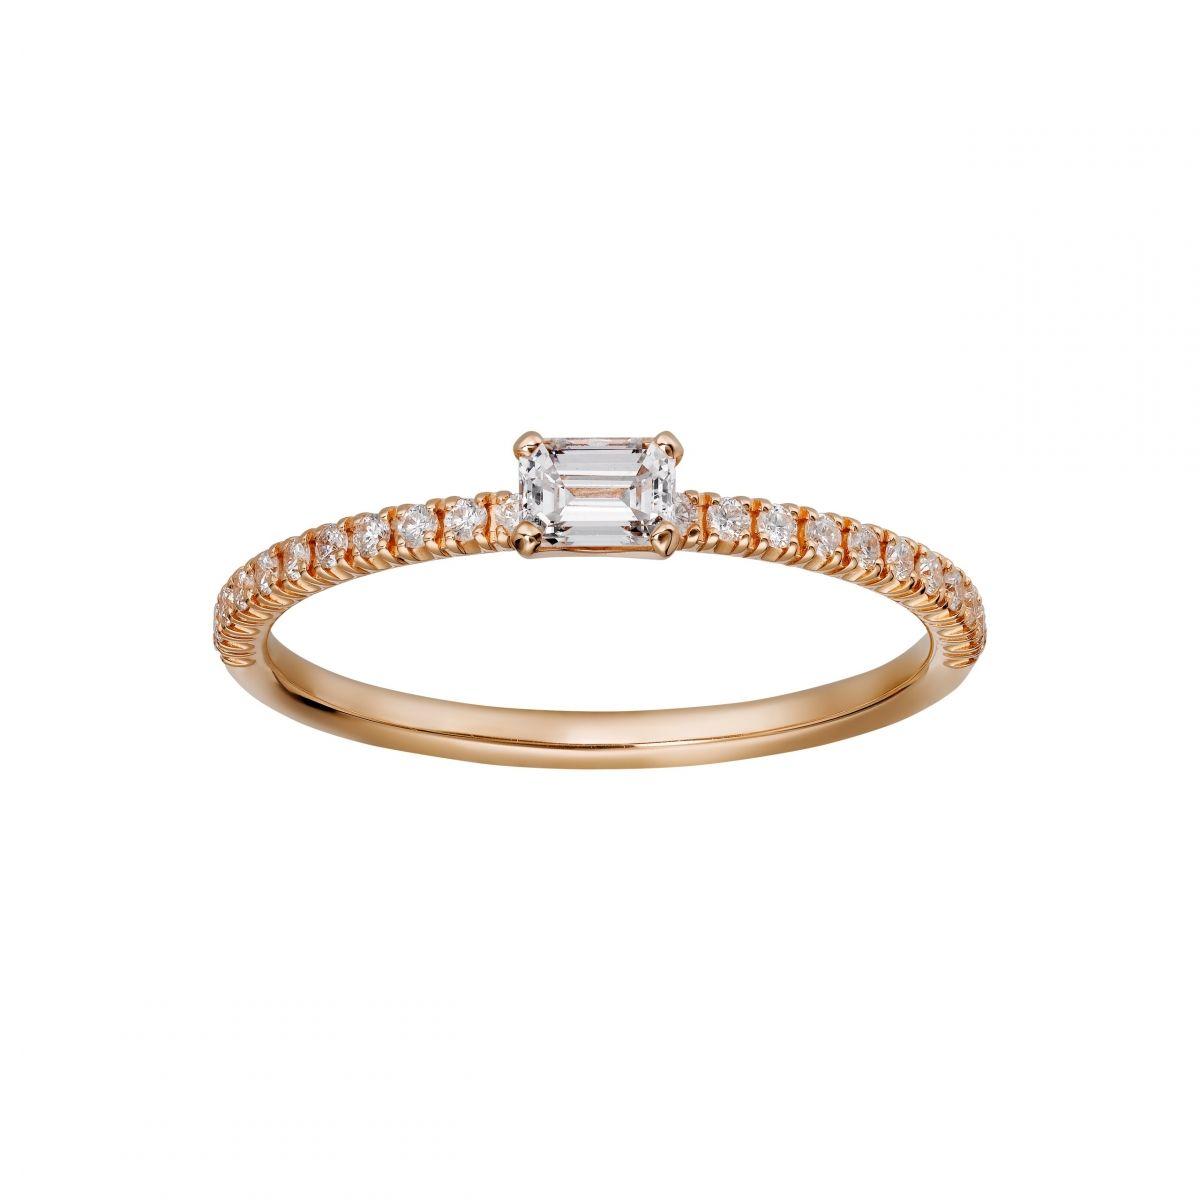 cartier 日常に映える可憐でエレガントなダイヤモンドリング ウェディング特集 spur 婚約指輪 カルティエ 婚約指輪 重ね付け カルティエ リング